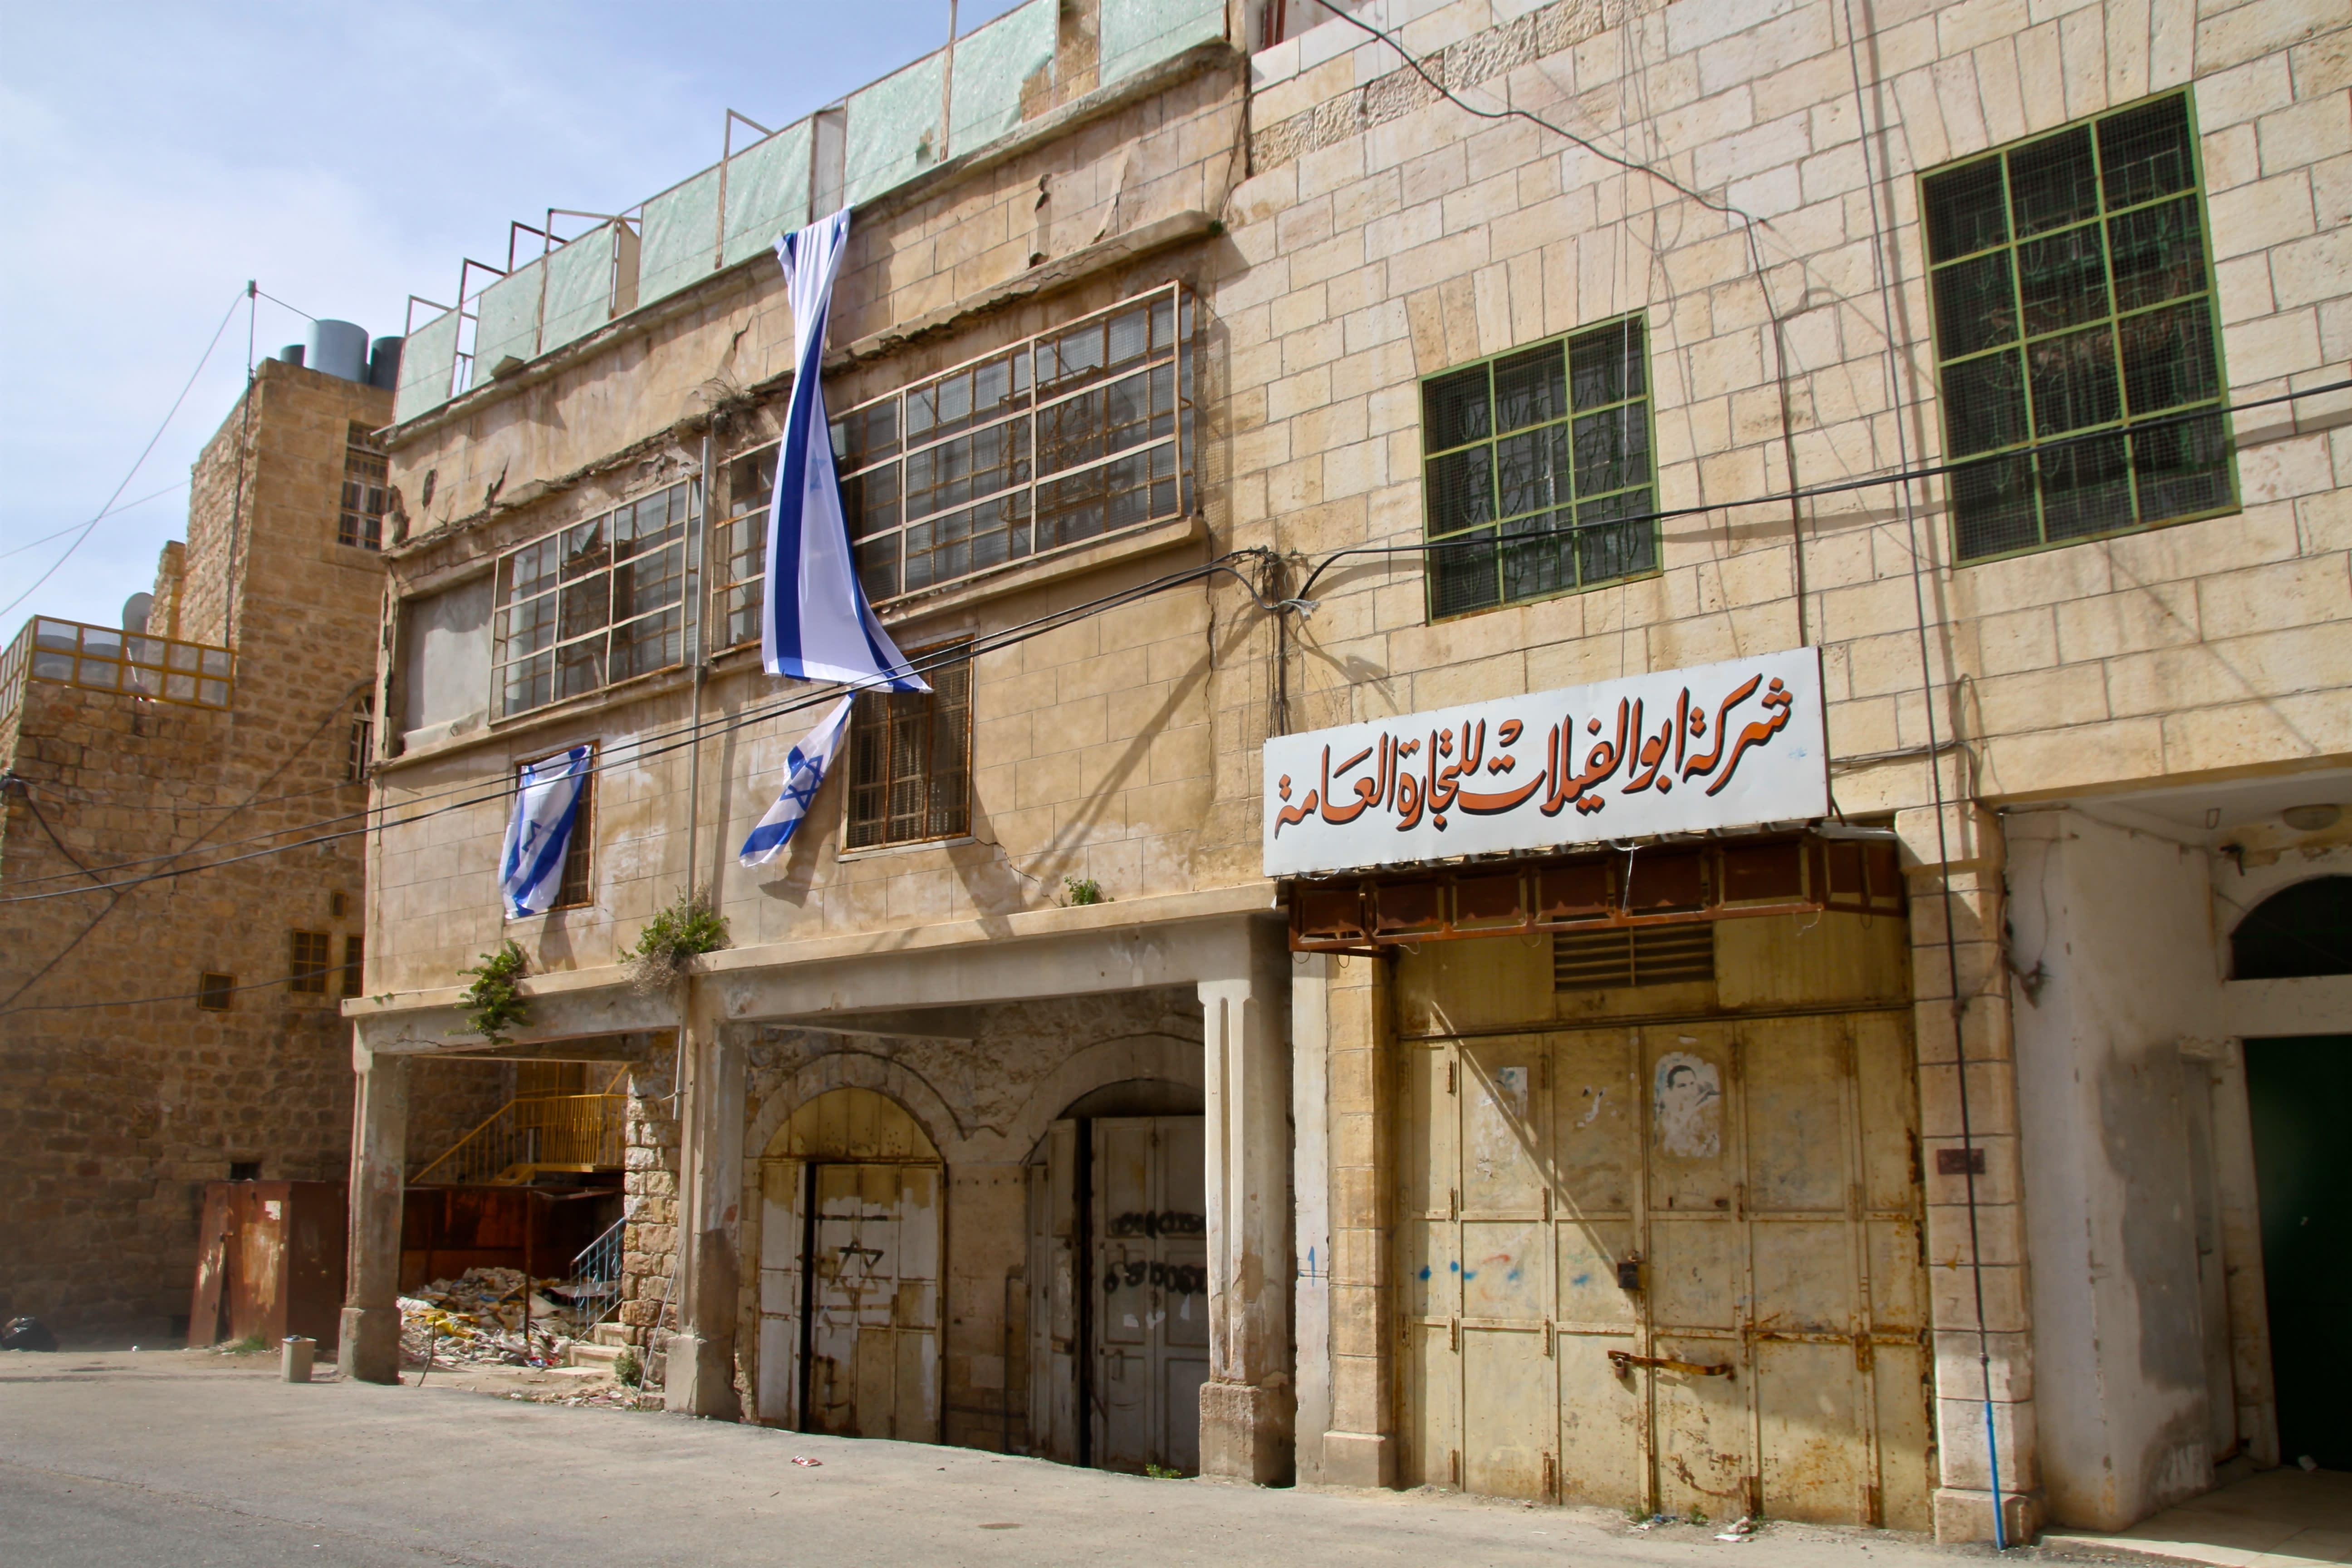 Beit Rachel and Beit Leah in Hebron (Tovah Lazaroff)